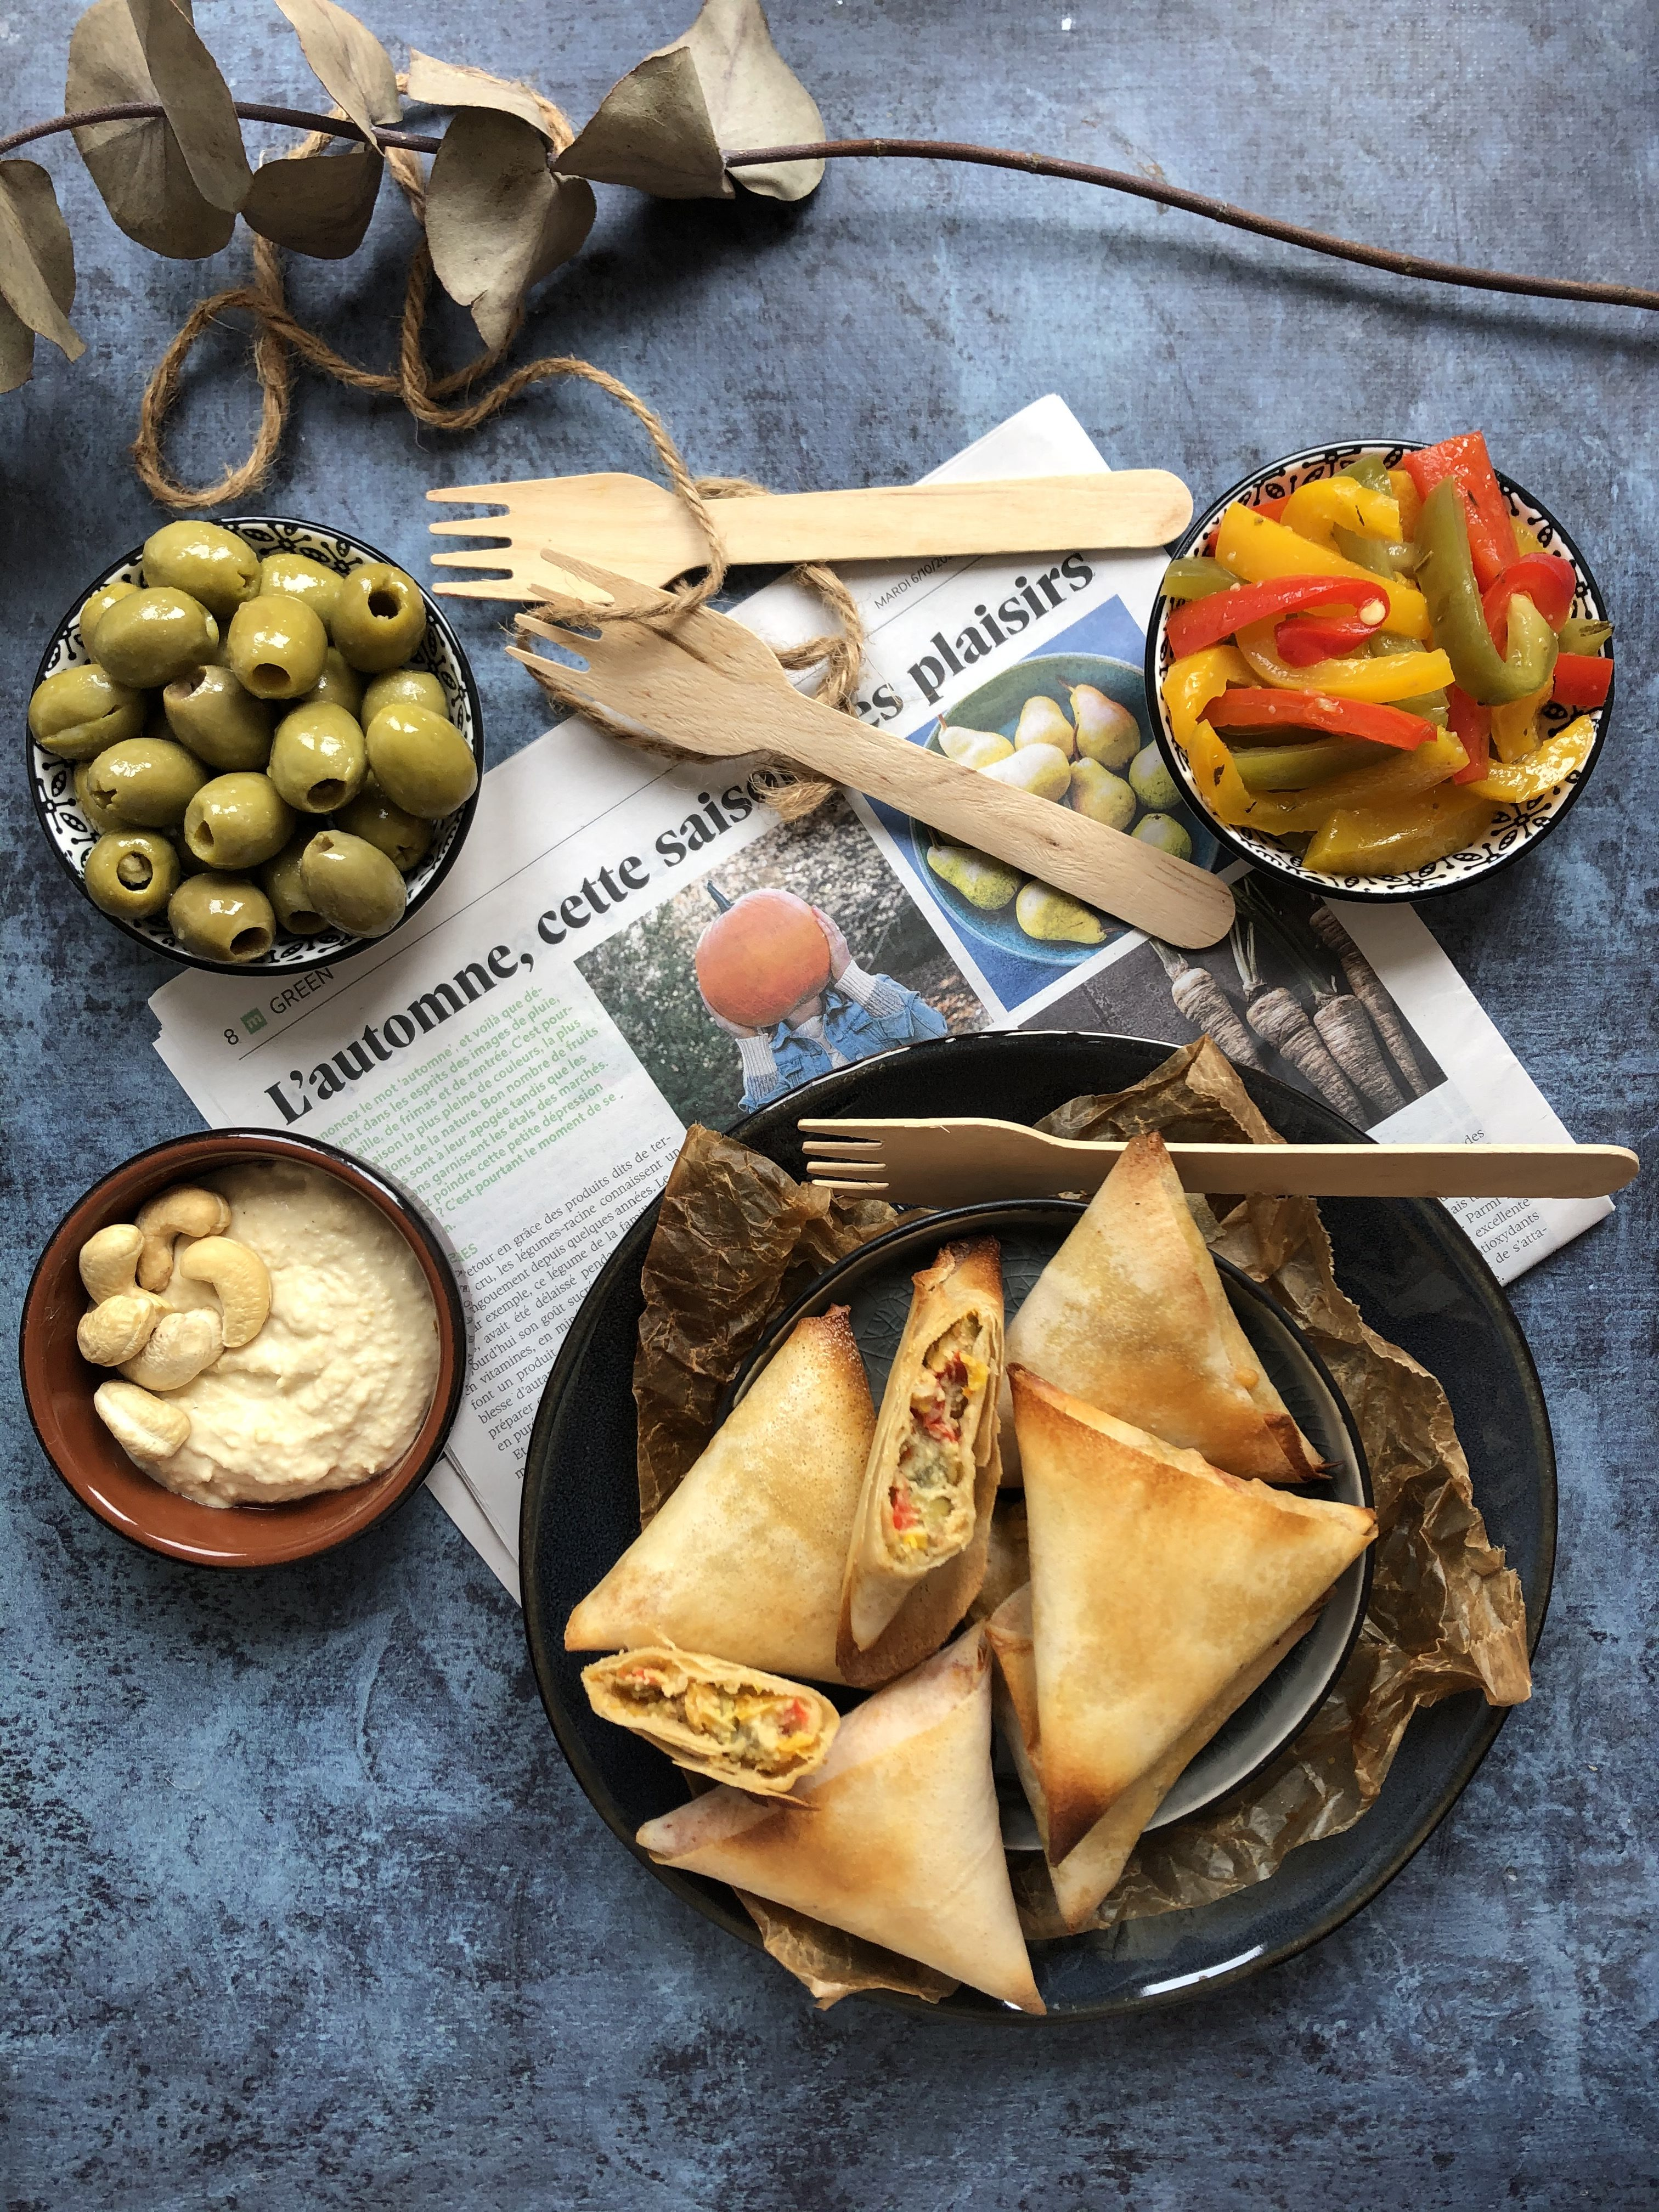 Samossa poivronnade, olive et houmous